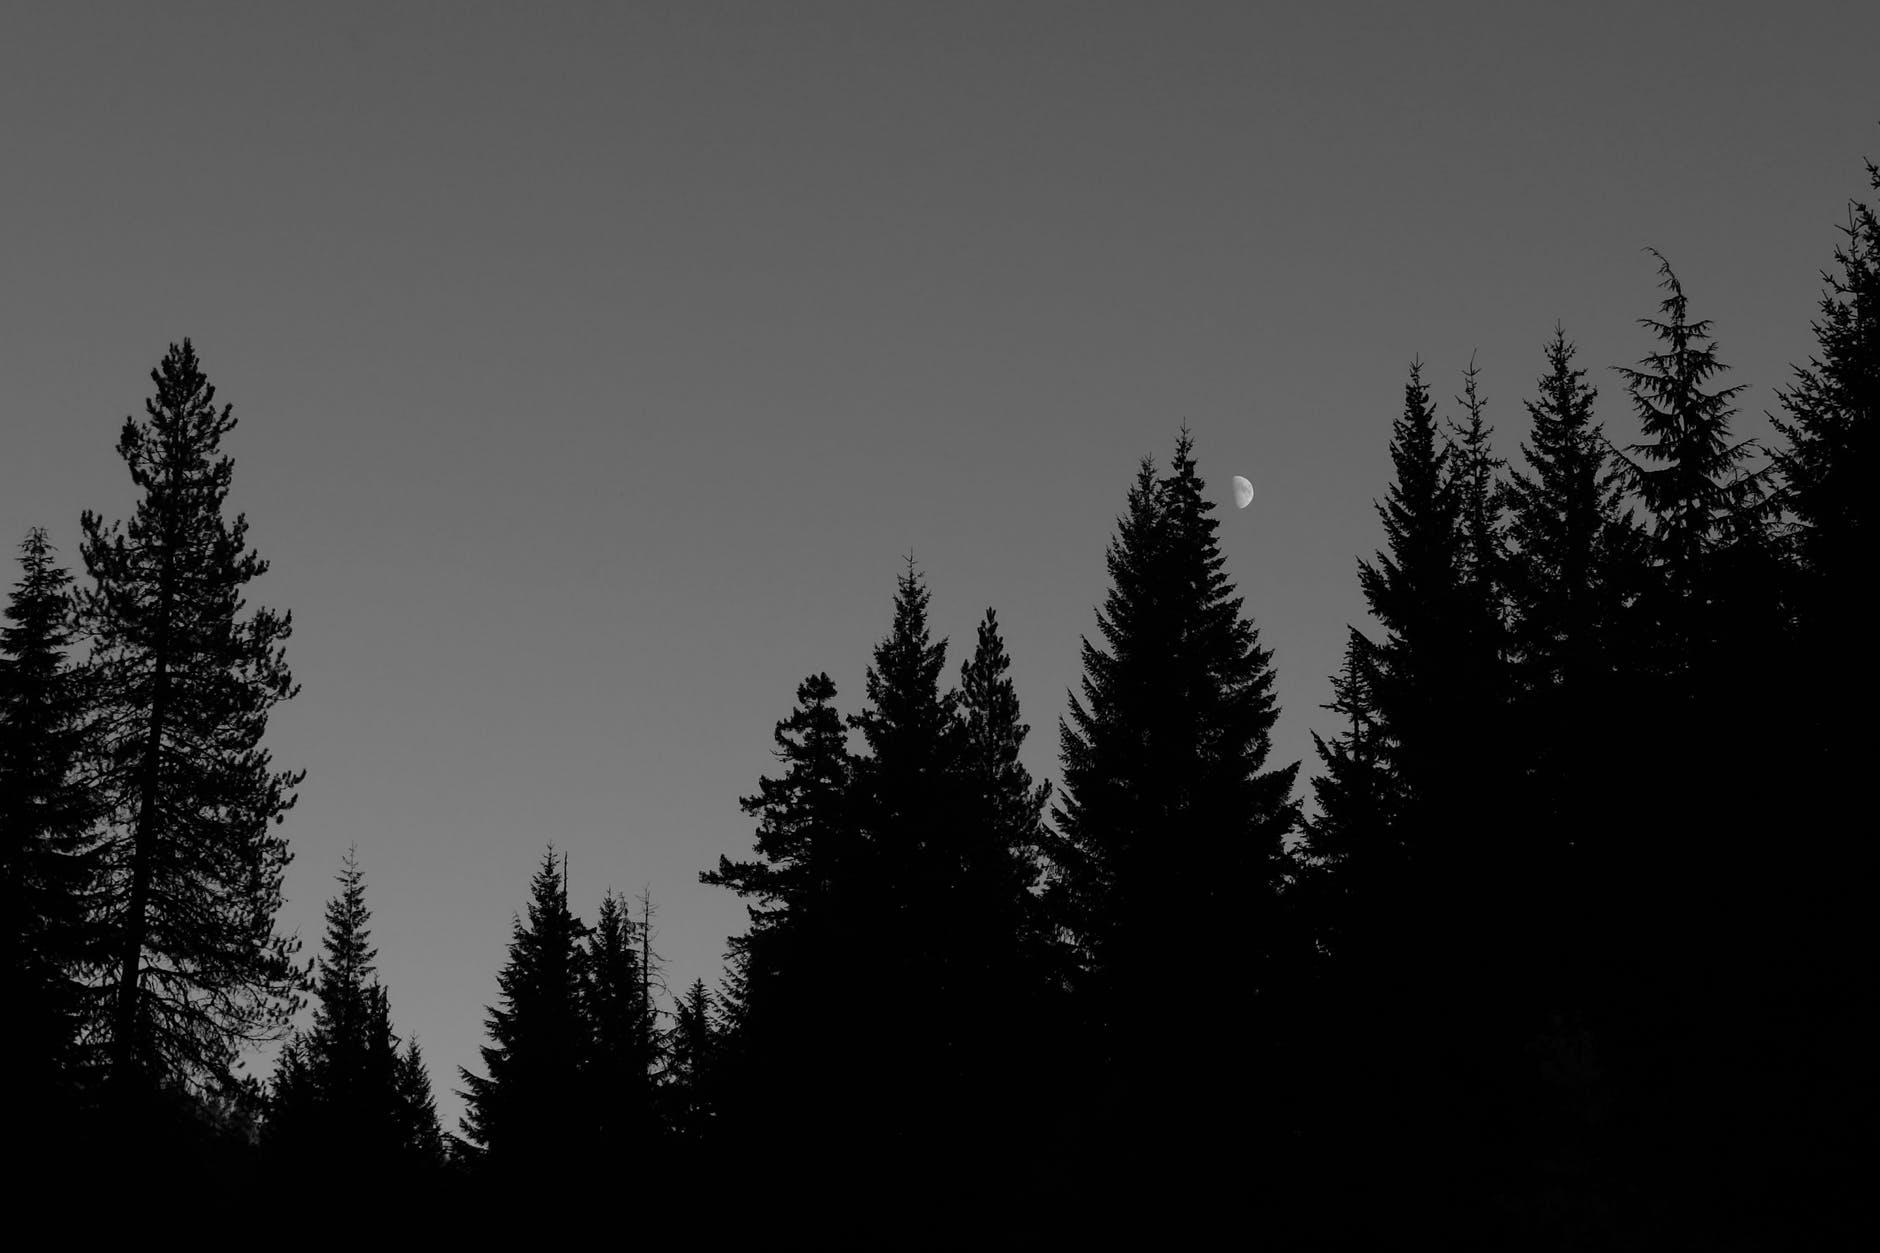 pexels-photo-5810252.jpeg